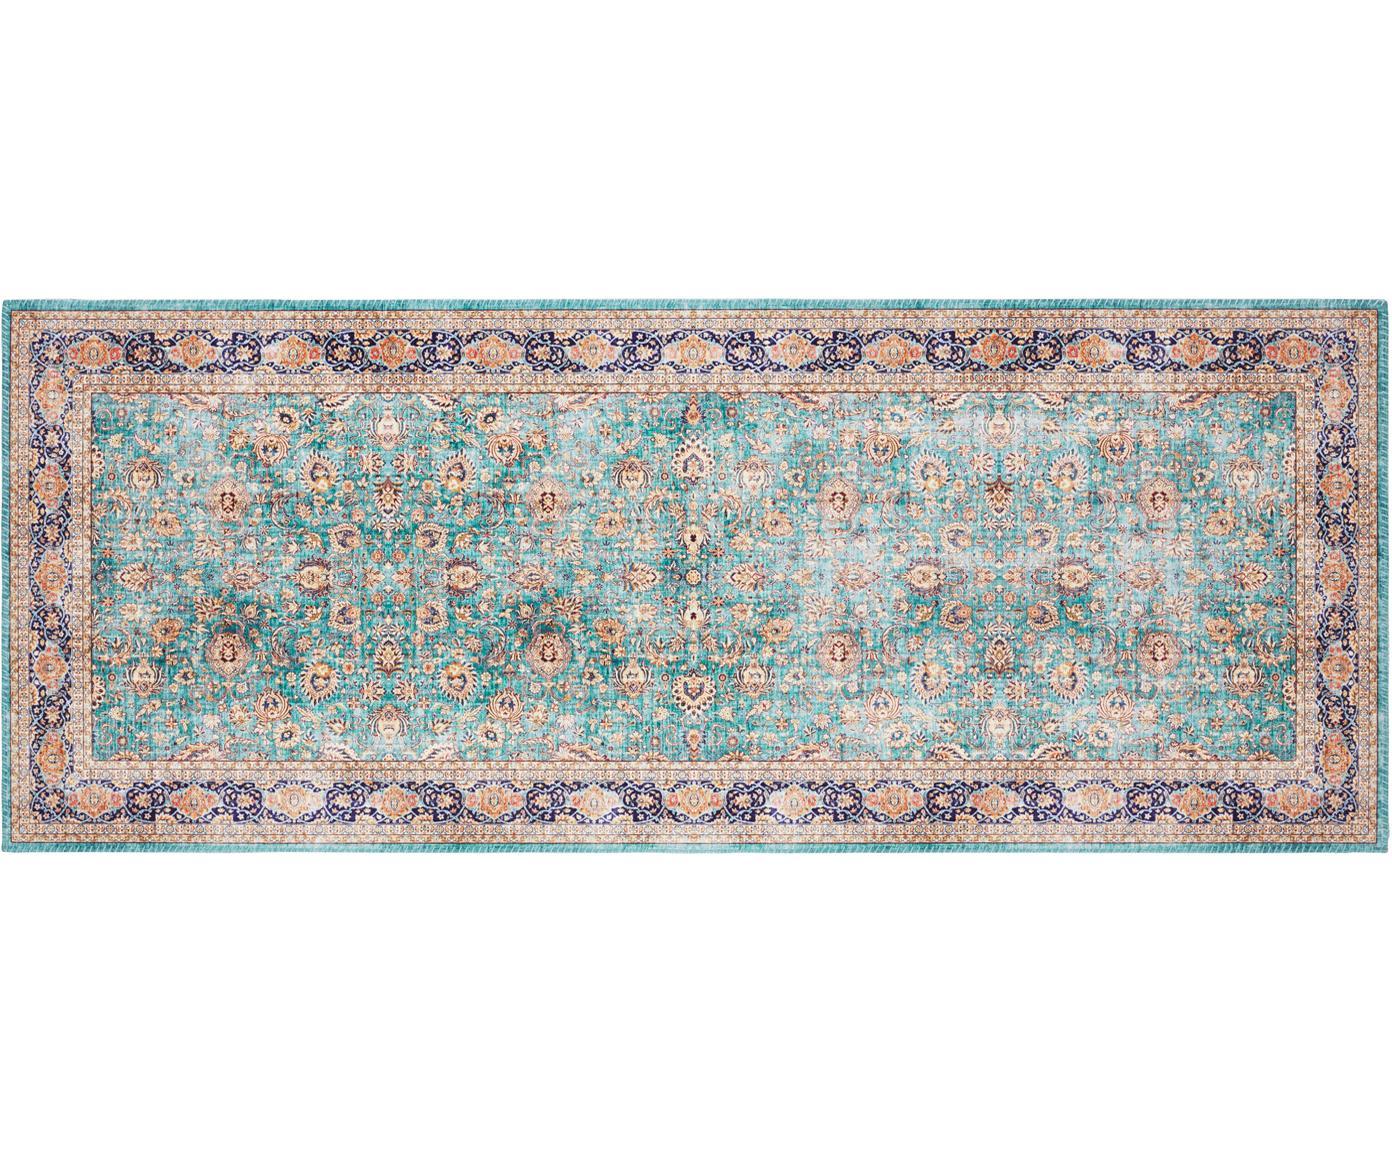 Läufer Keshan Maschad im Orient Style, Jadegrün, Mehrfarbig, 80 x 200 cm